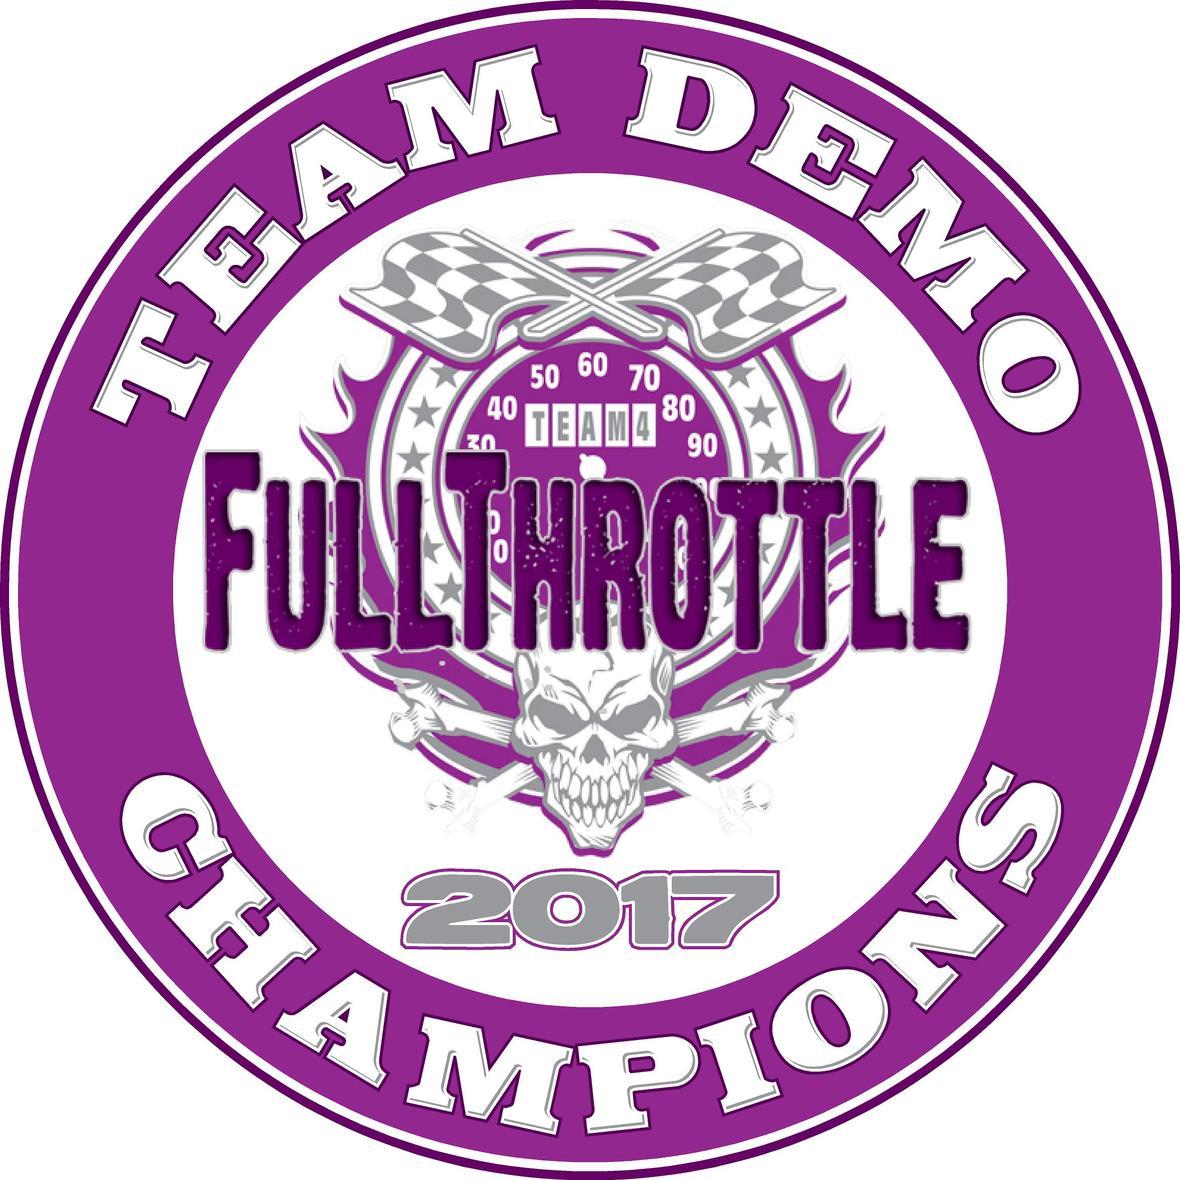 66 team 4 logo